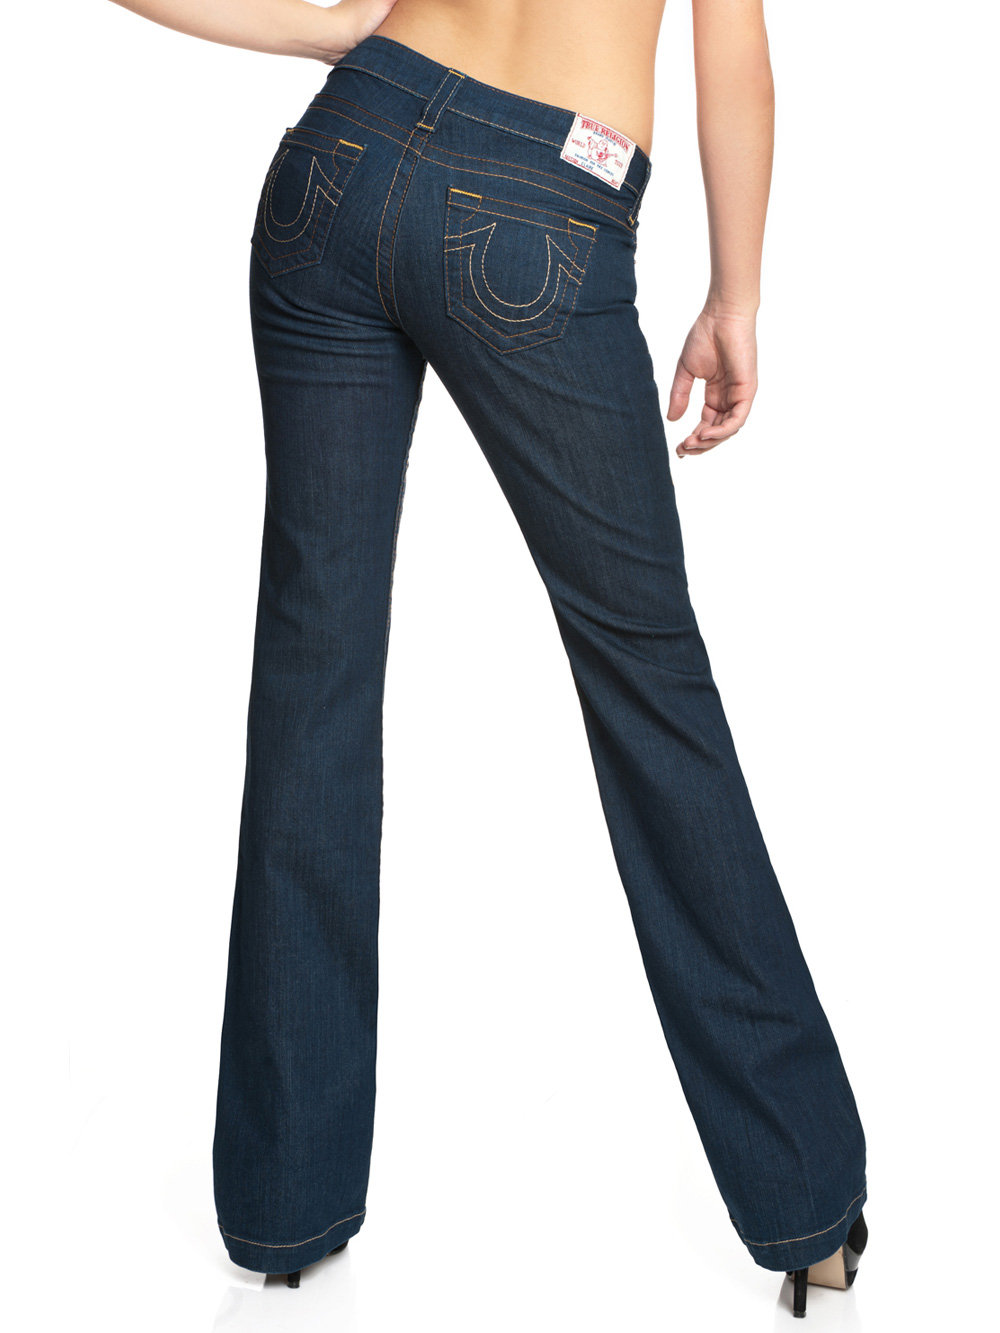 true religion damen jeans claire bootcut blue denim neu ebay. Black Bedroom Furniture Sets. Home Design Ideas